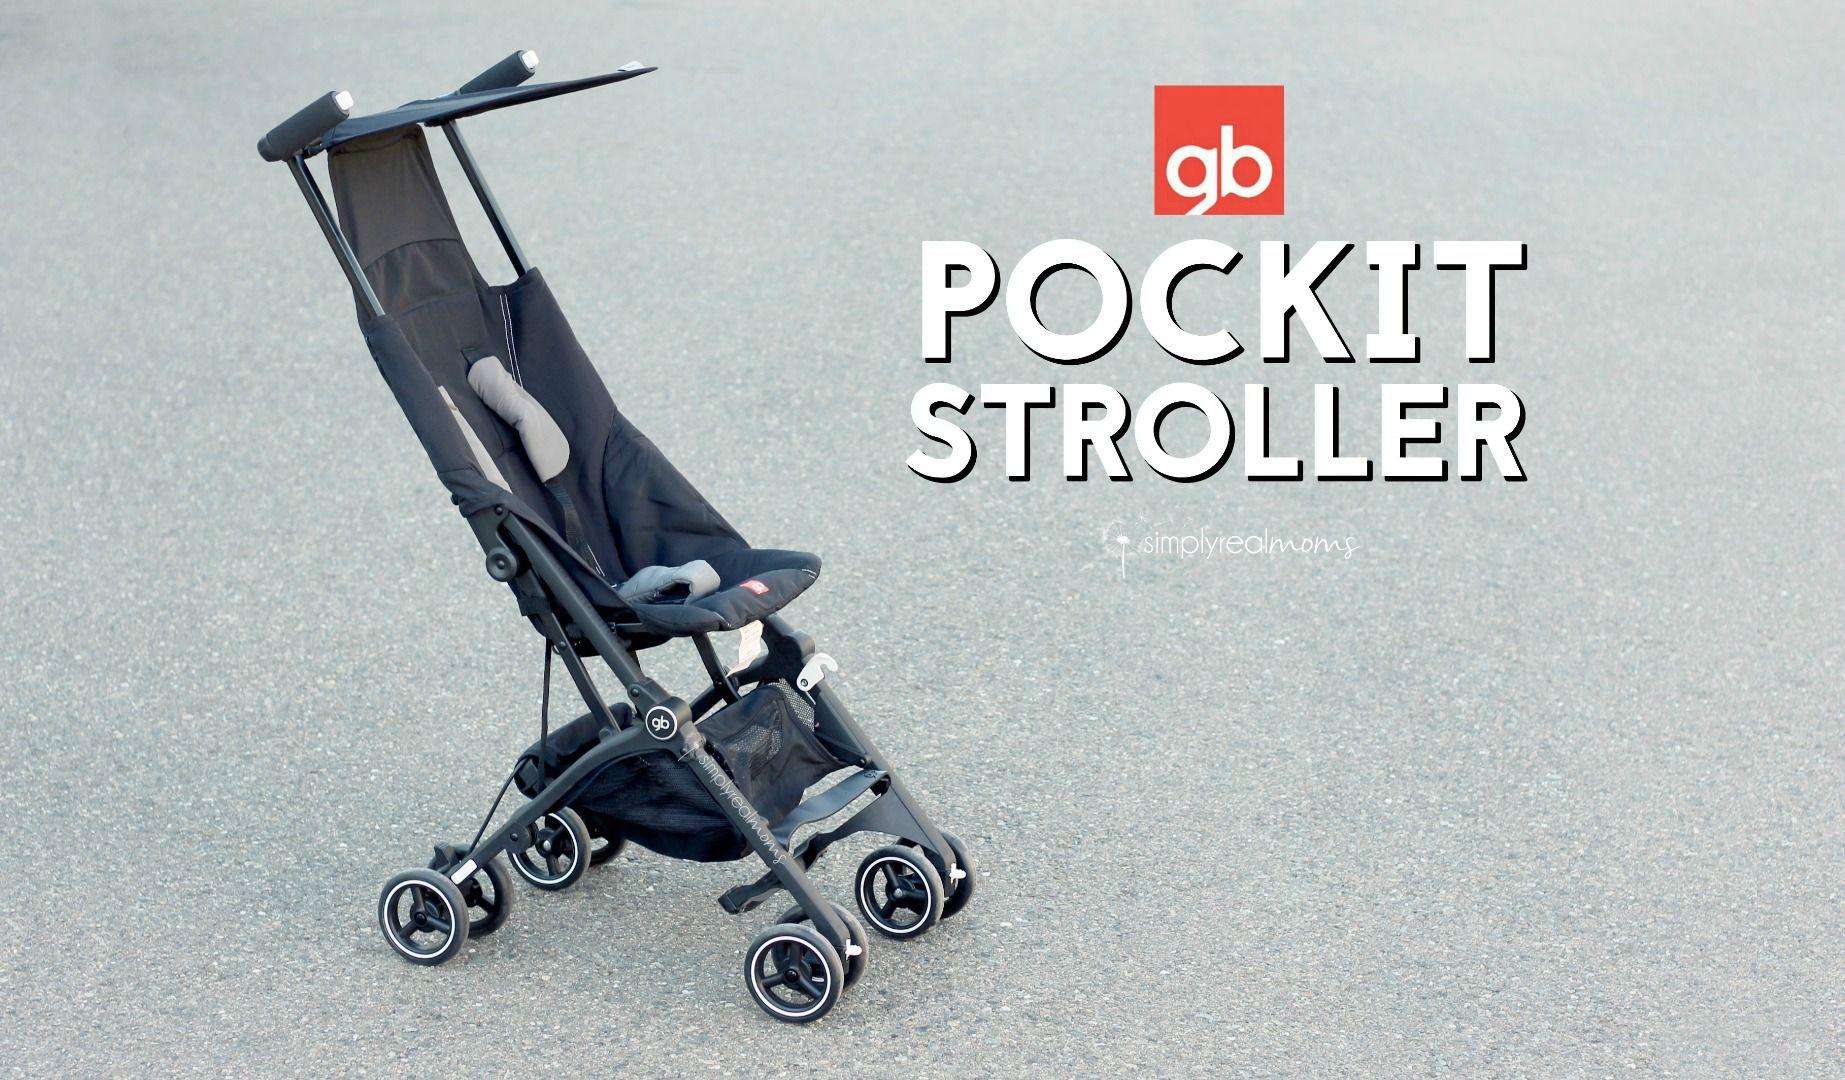 Pockit Stroller Feat. Gb pockit stroller, Stroller